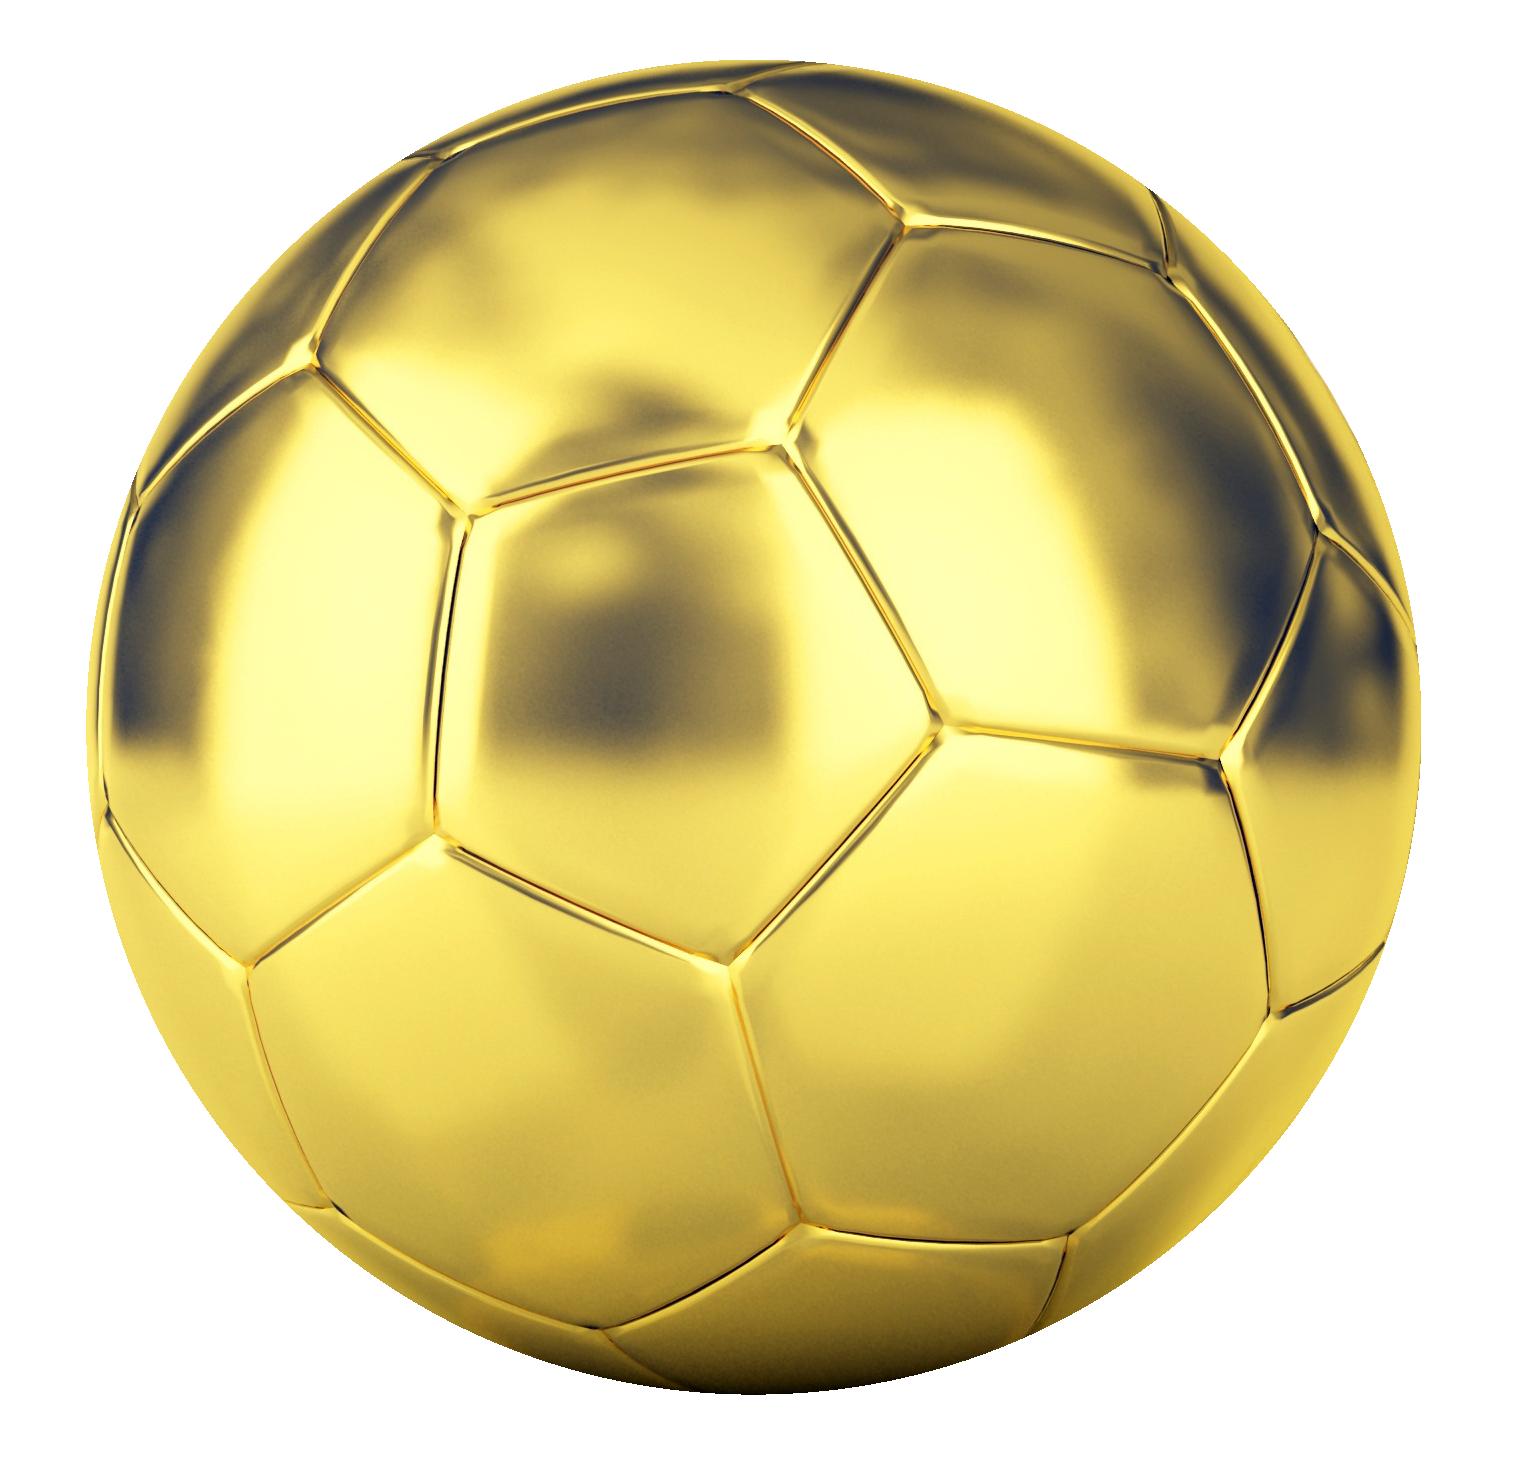 Football PNG - 188